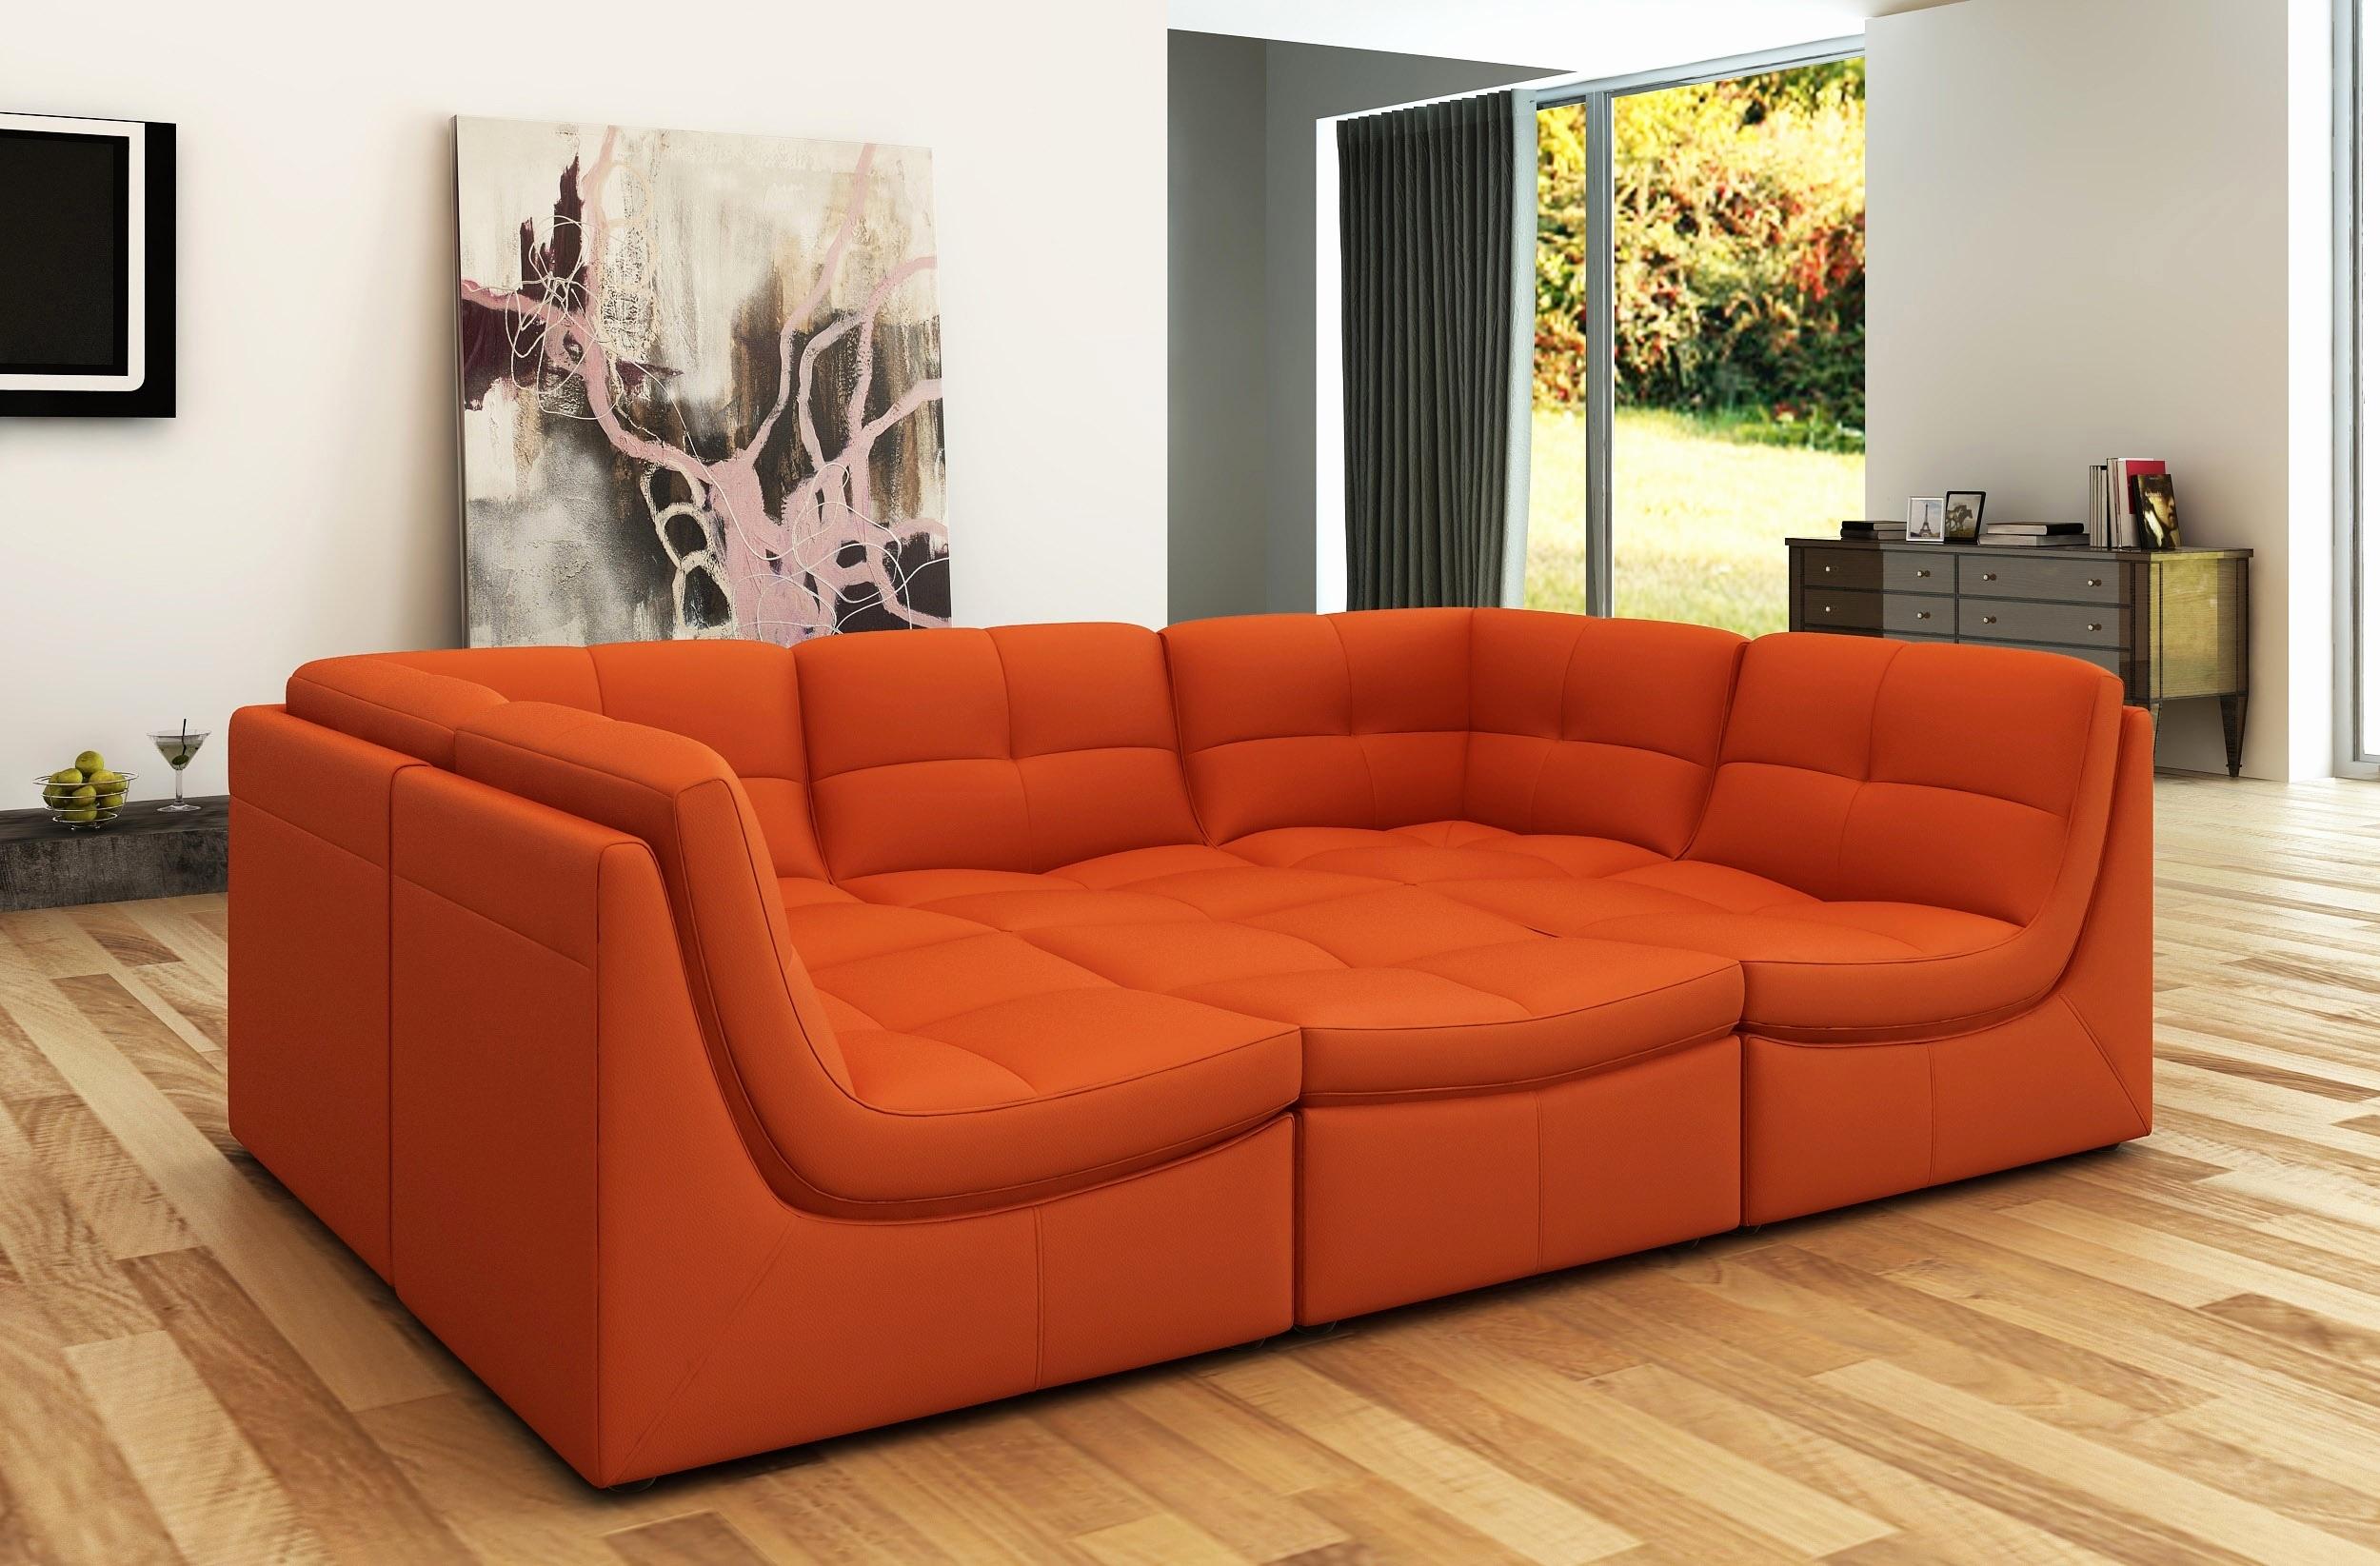 sofas by design des moines bettsofa gunstig online kaufen 10 collection of ia sectional sofa ideas